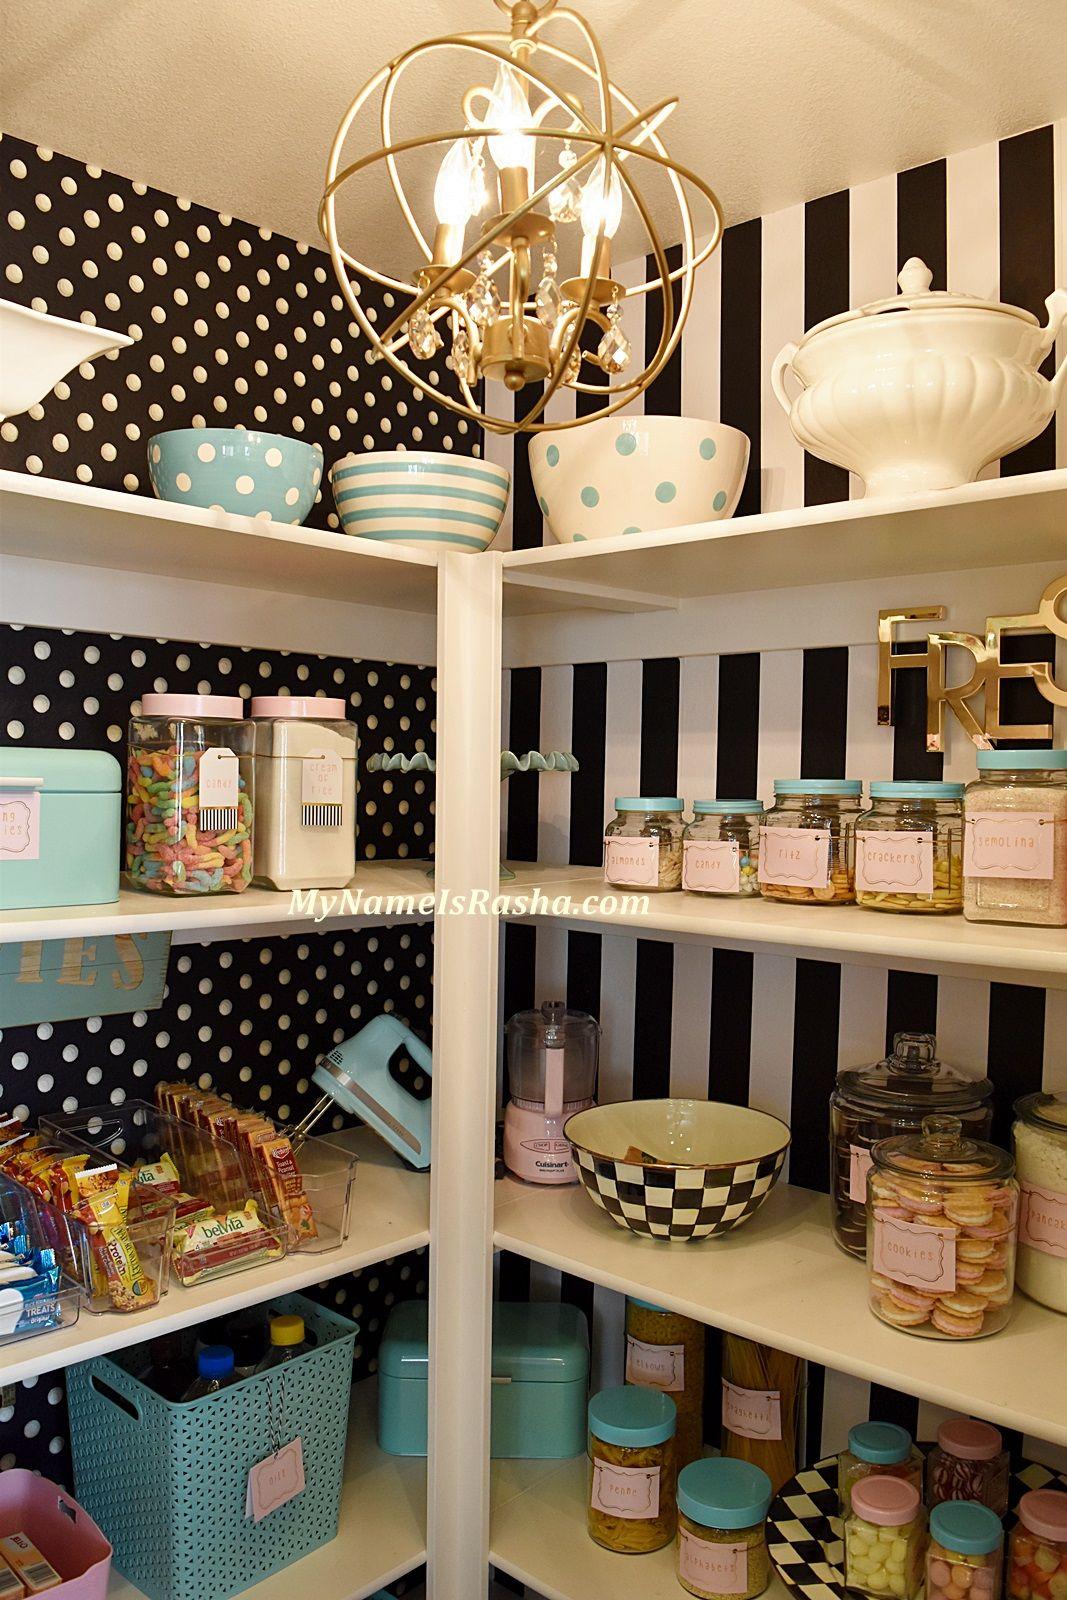 How To Organize Your Pantry. My Name Is Rasha إسمي رشا